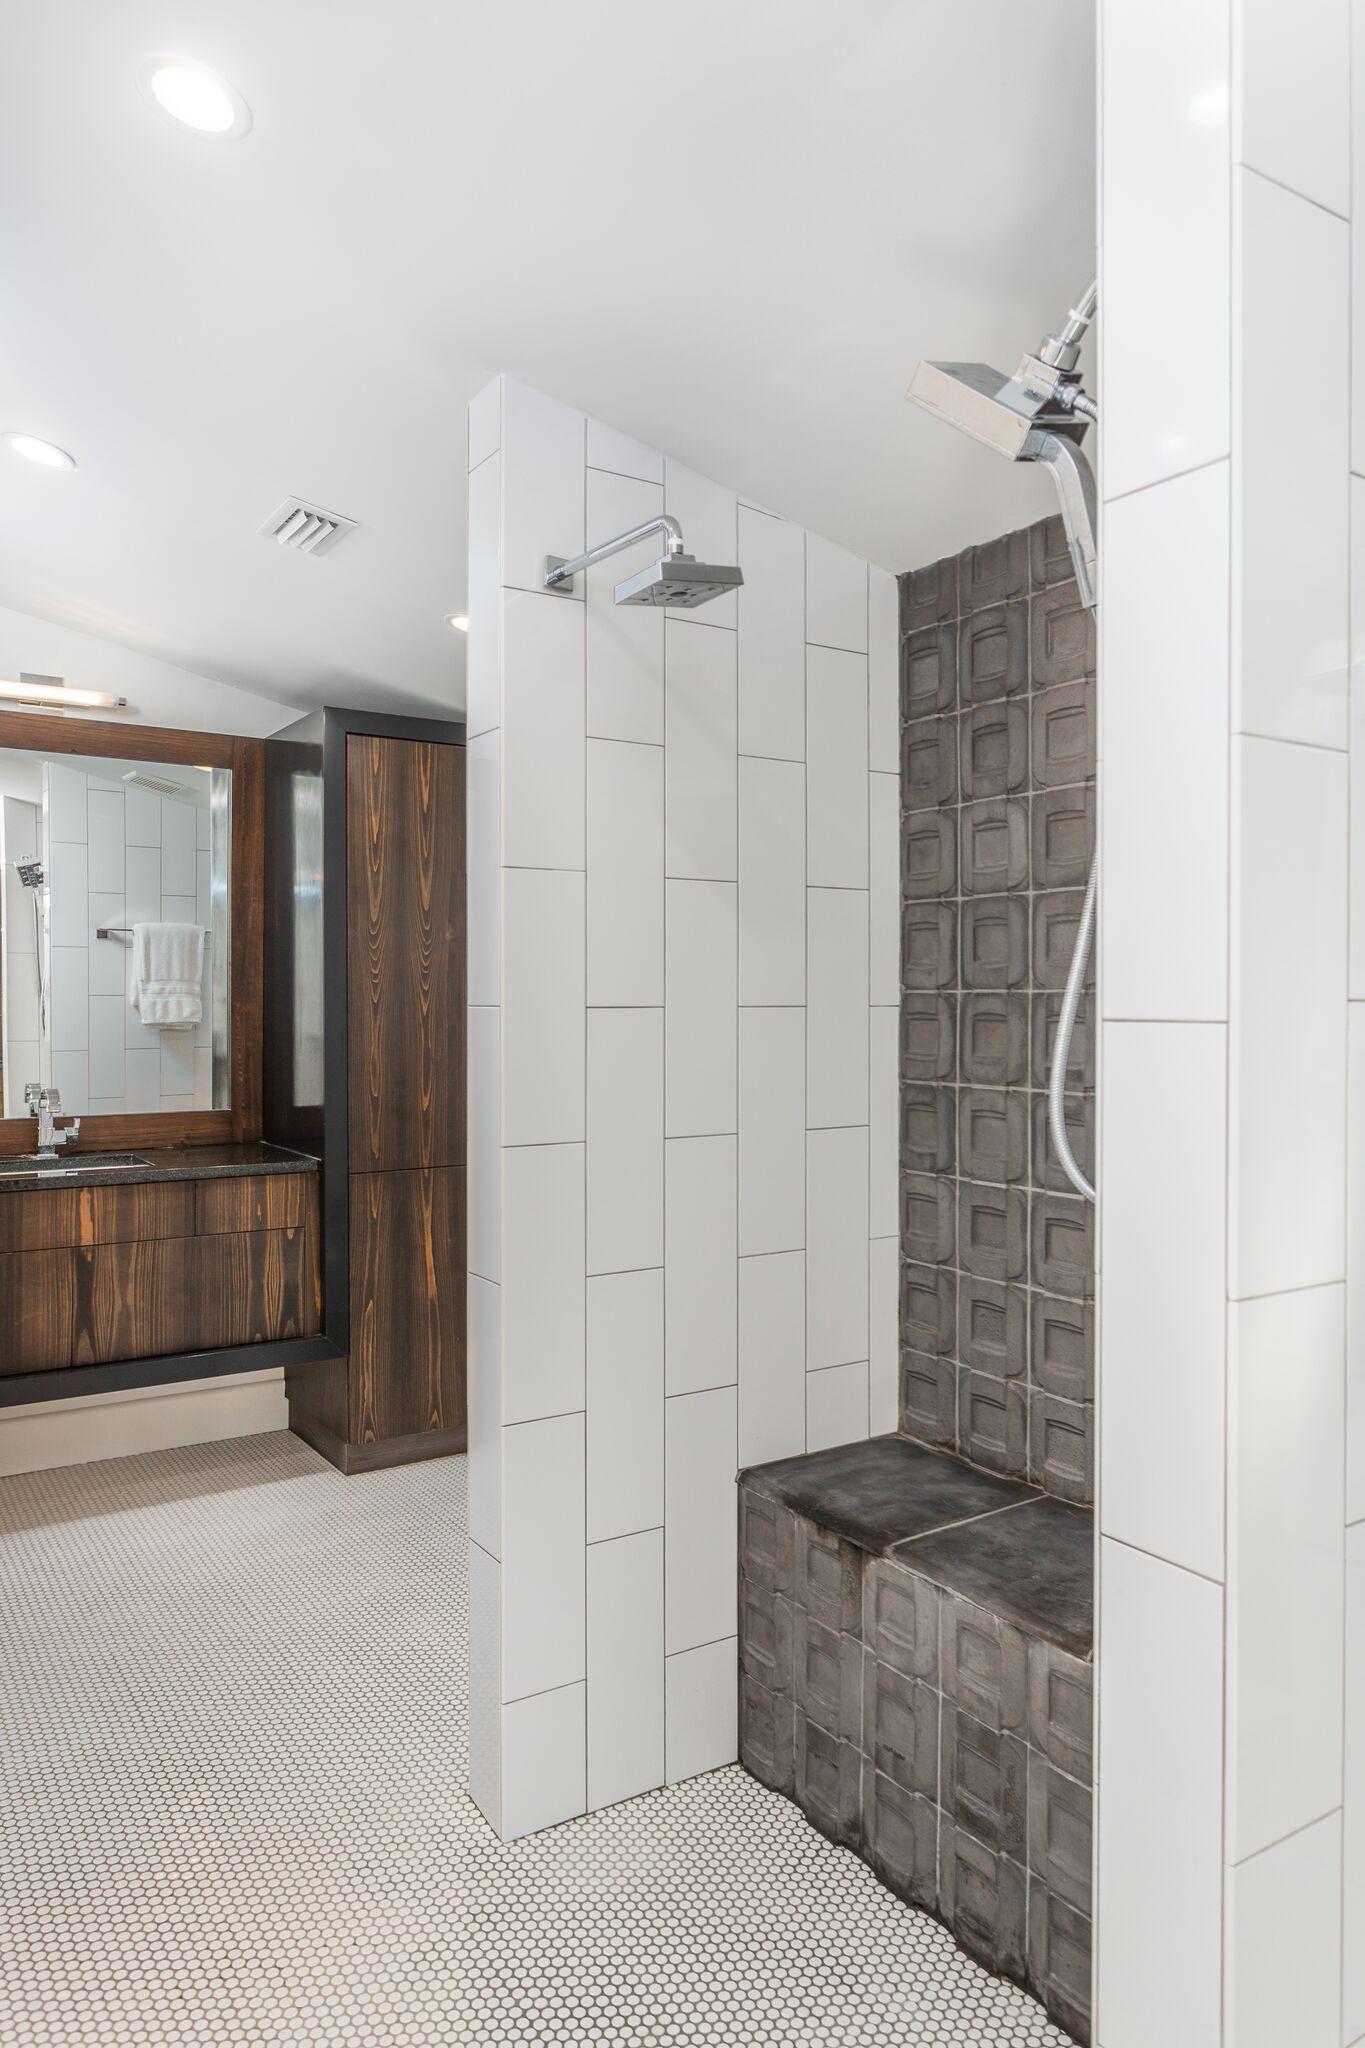 Concrete Tile in Shower